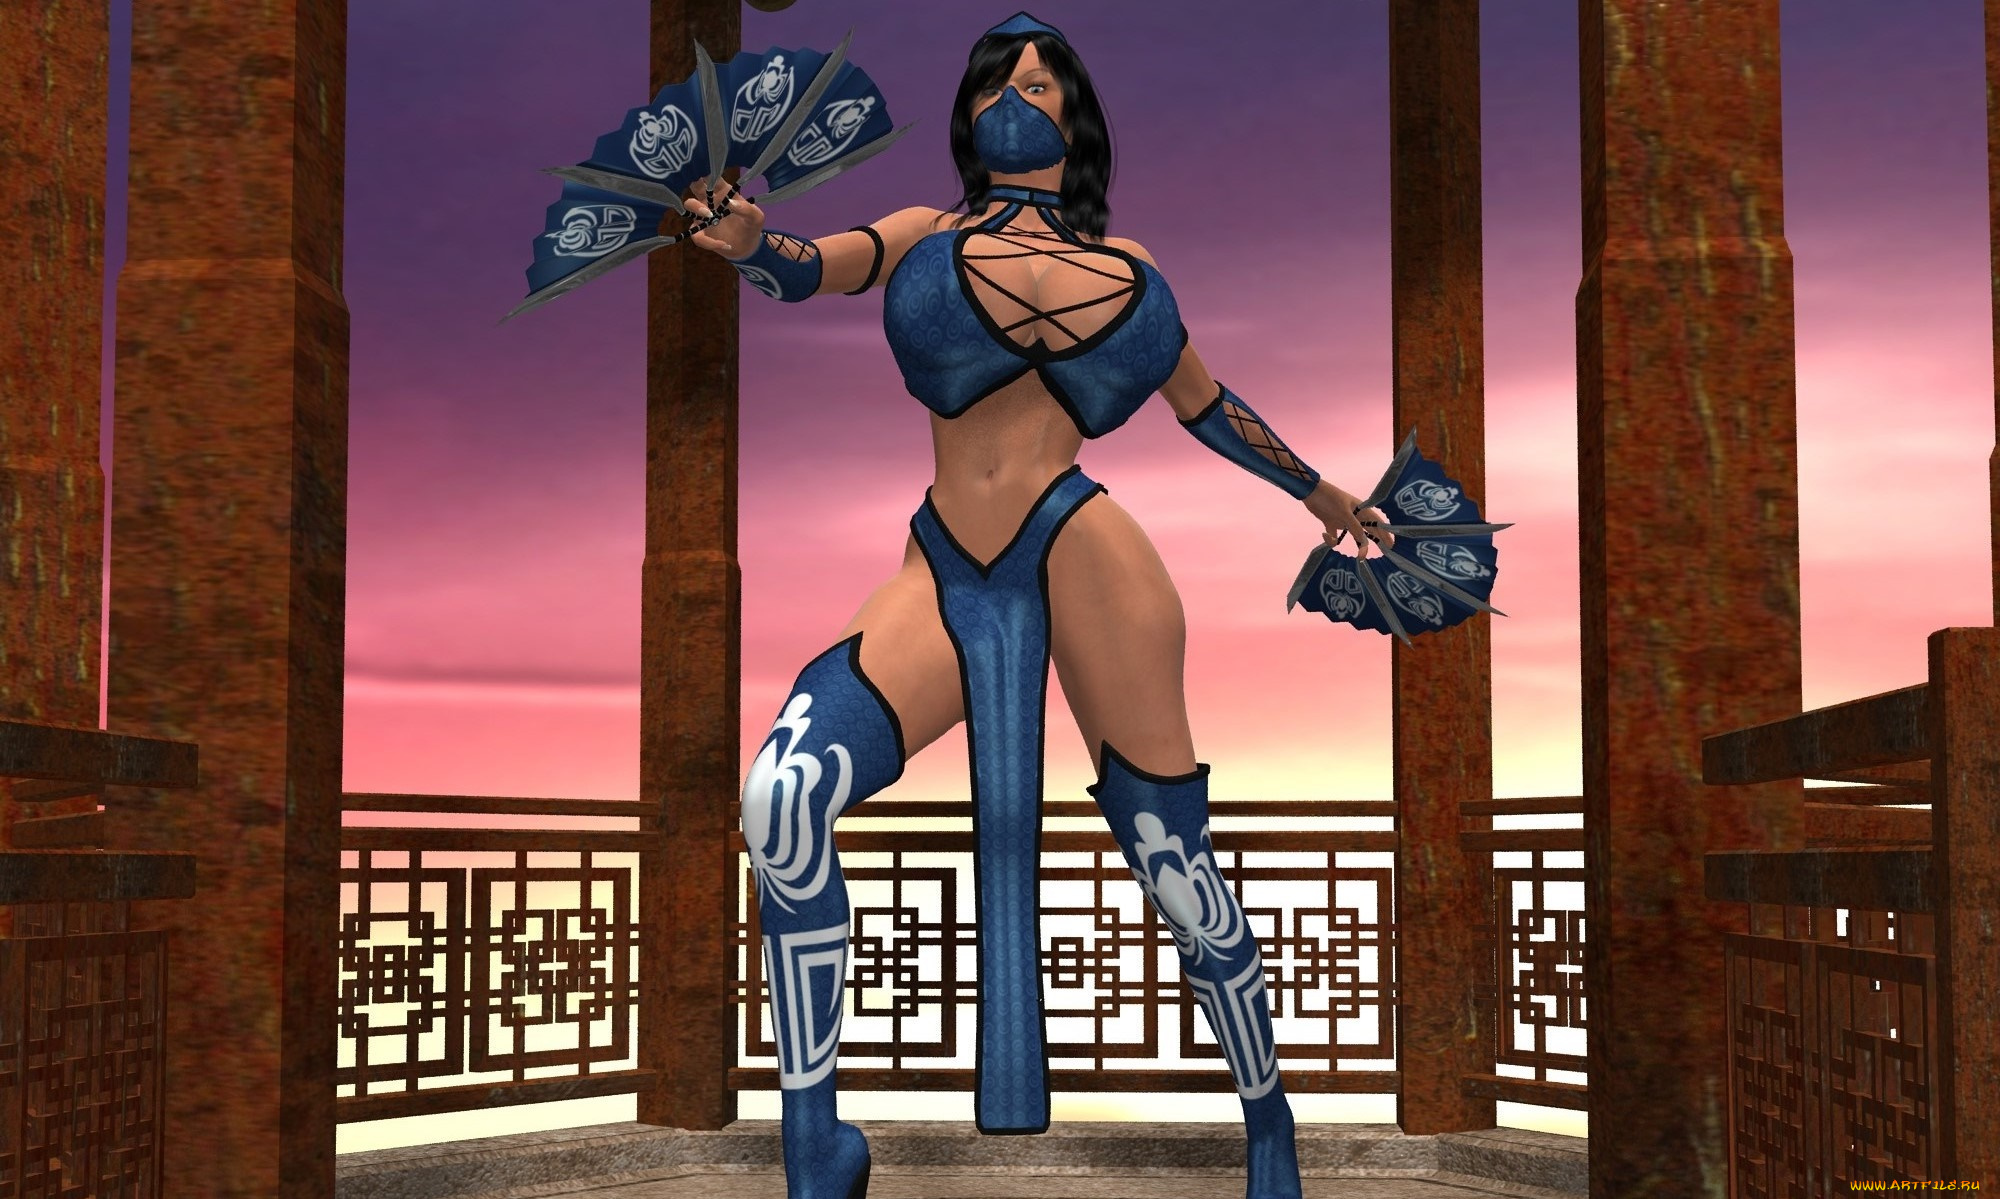 Mortal kombat sex porn henatai video fucking movie